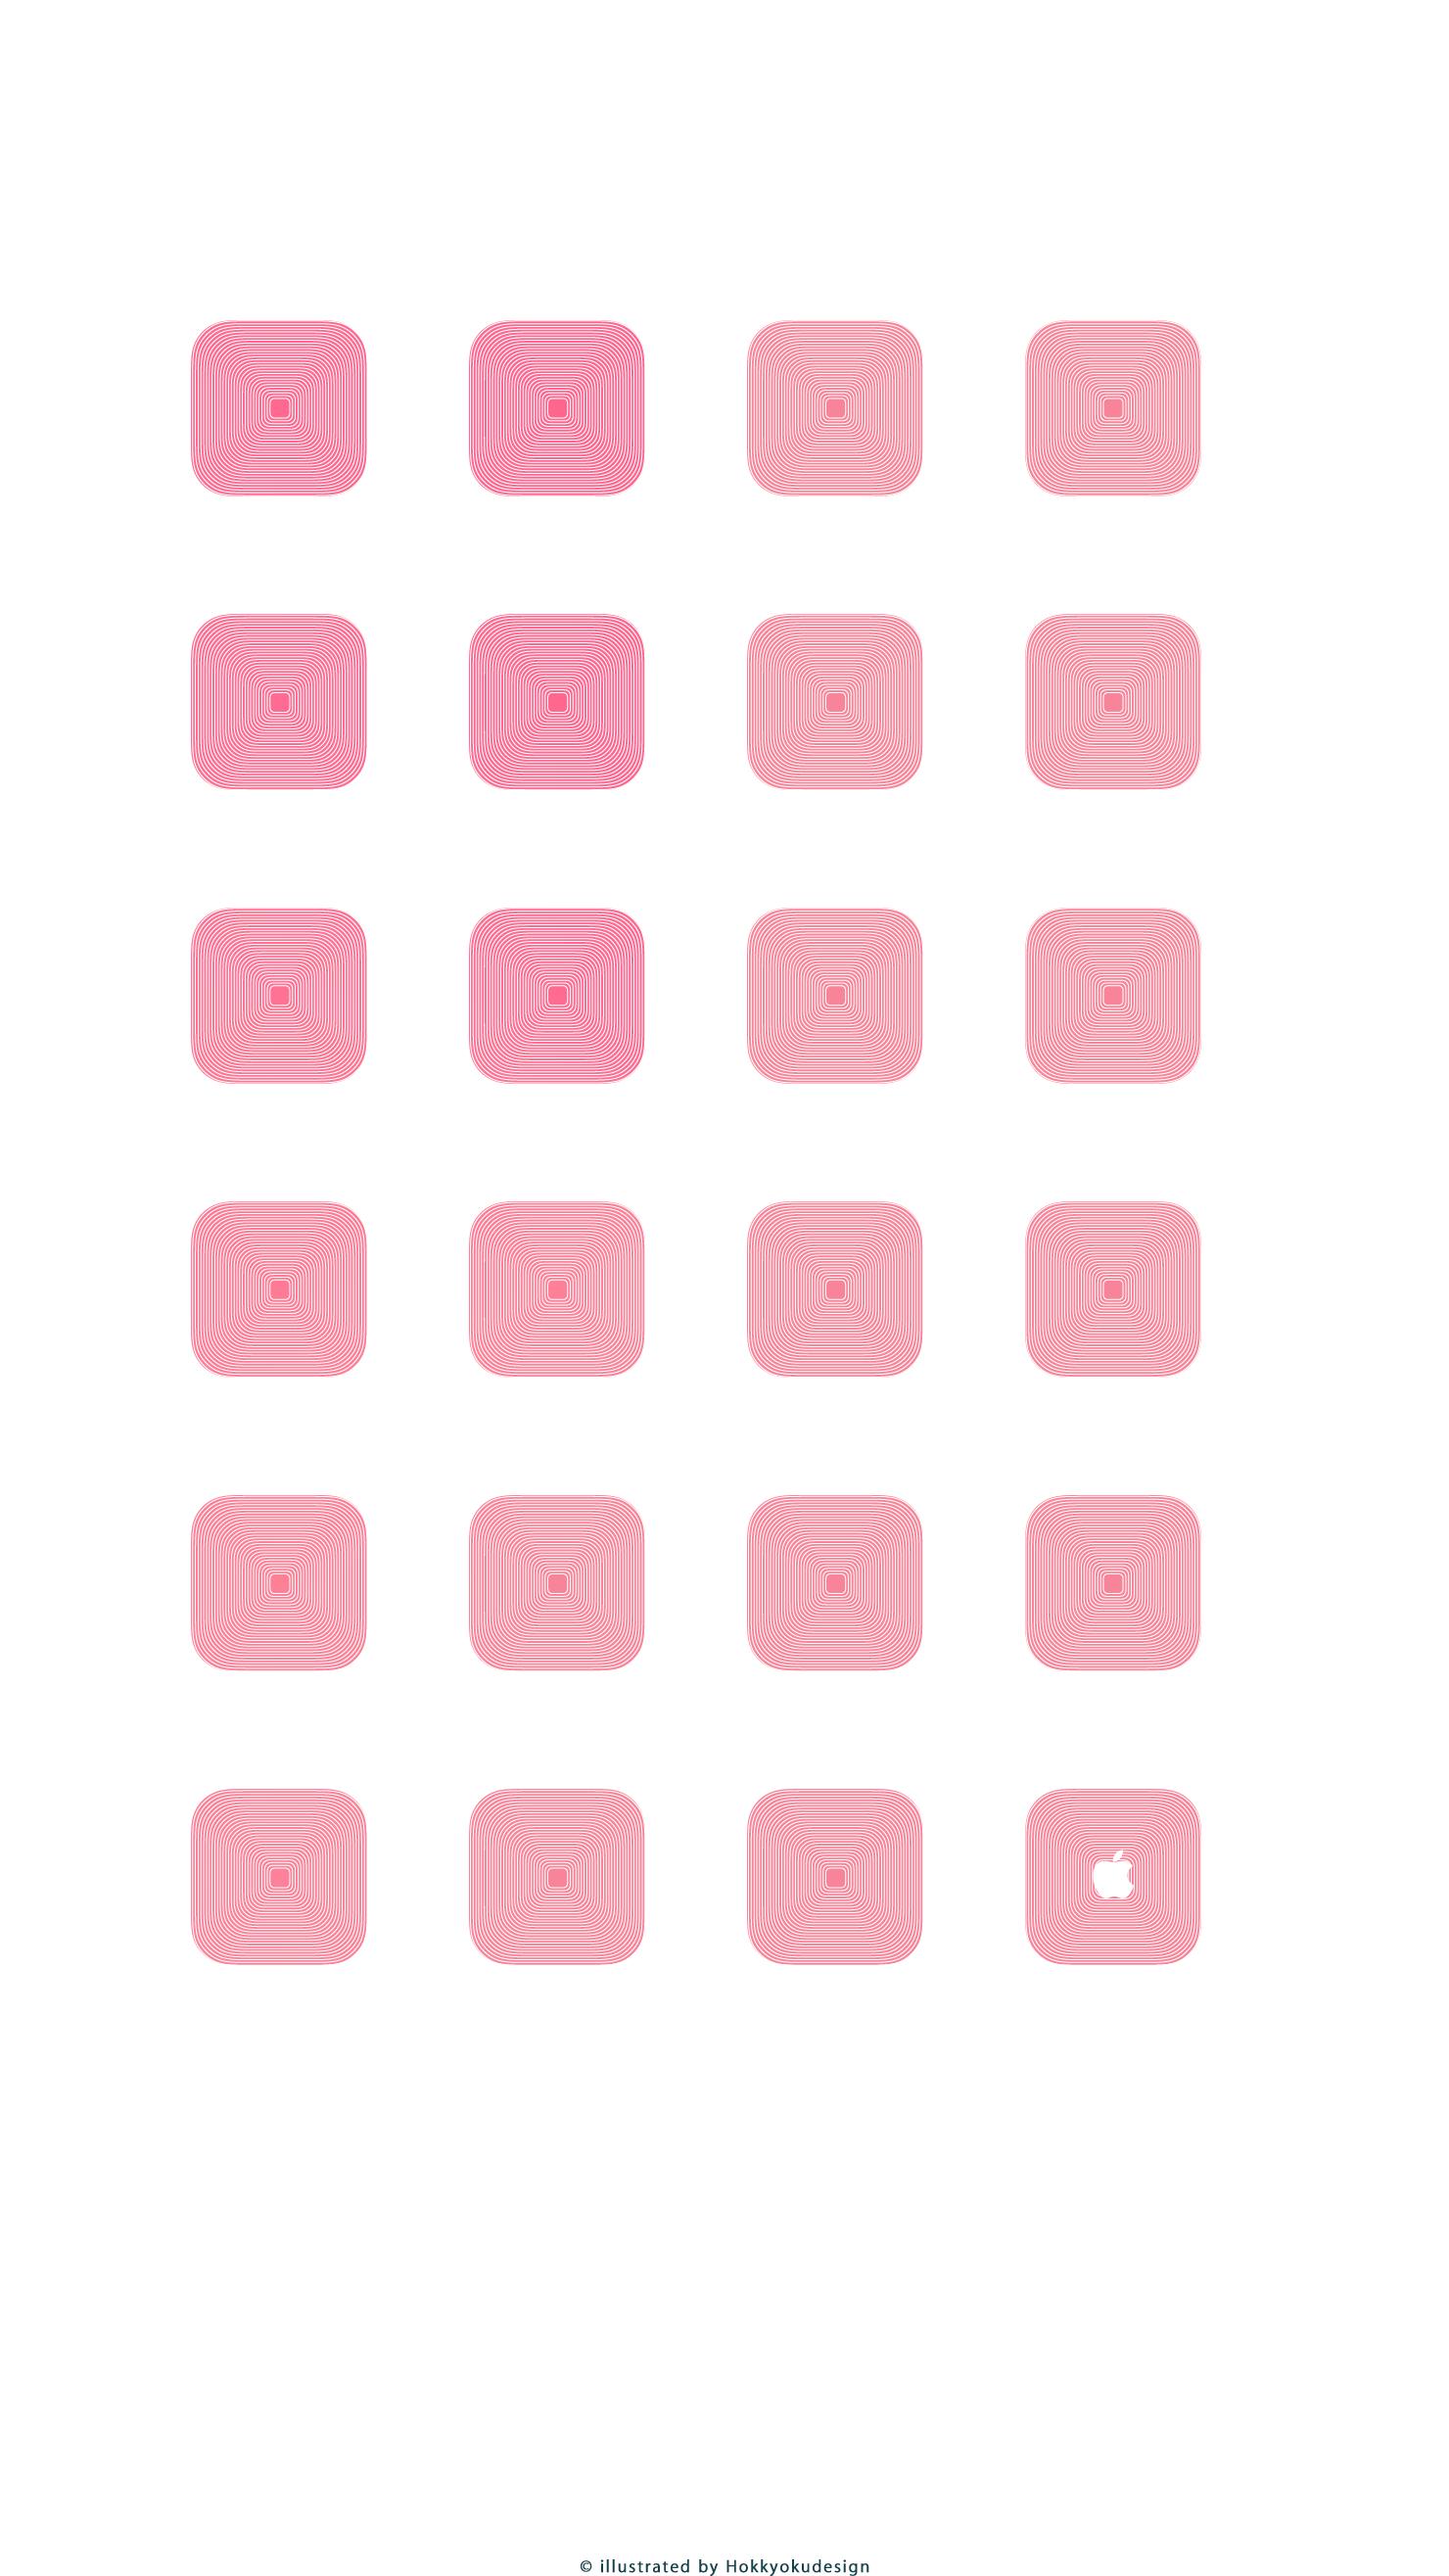 Iphone6 Plus専用 動く棚の壁紙 ピンク ホワイト Wallpaper To